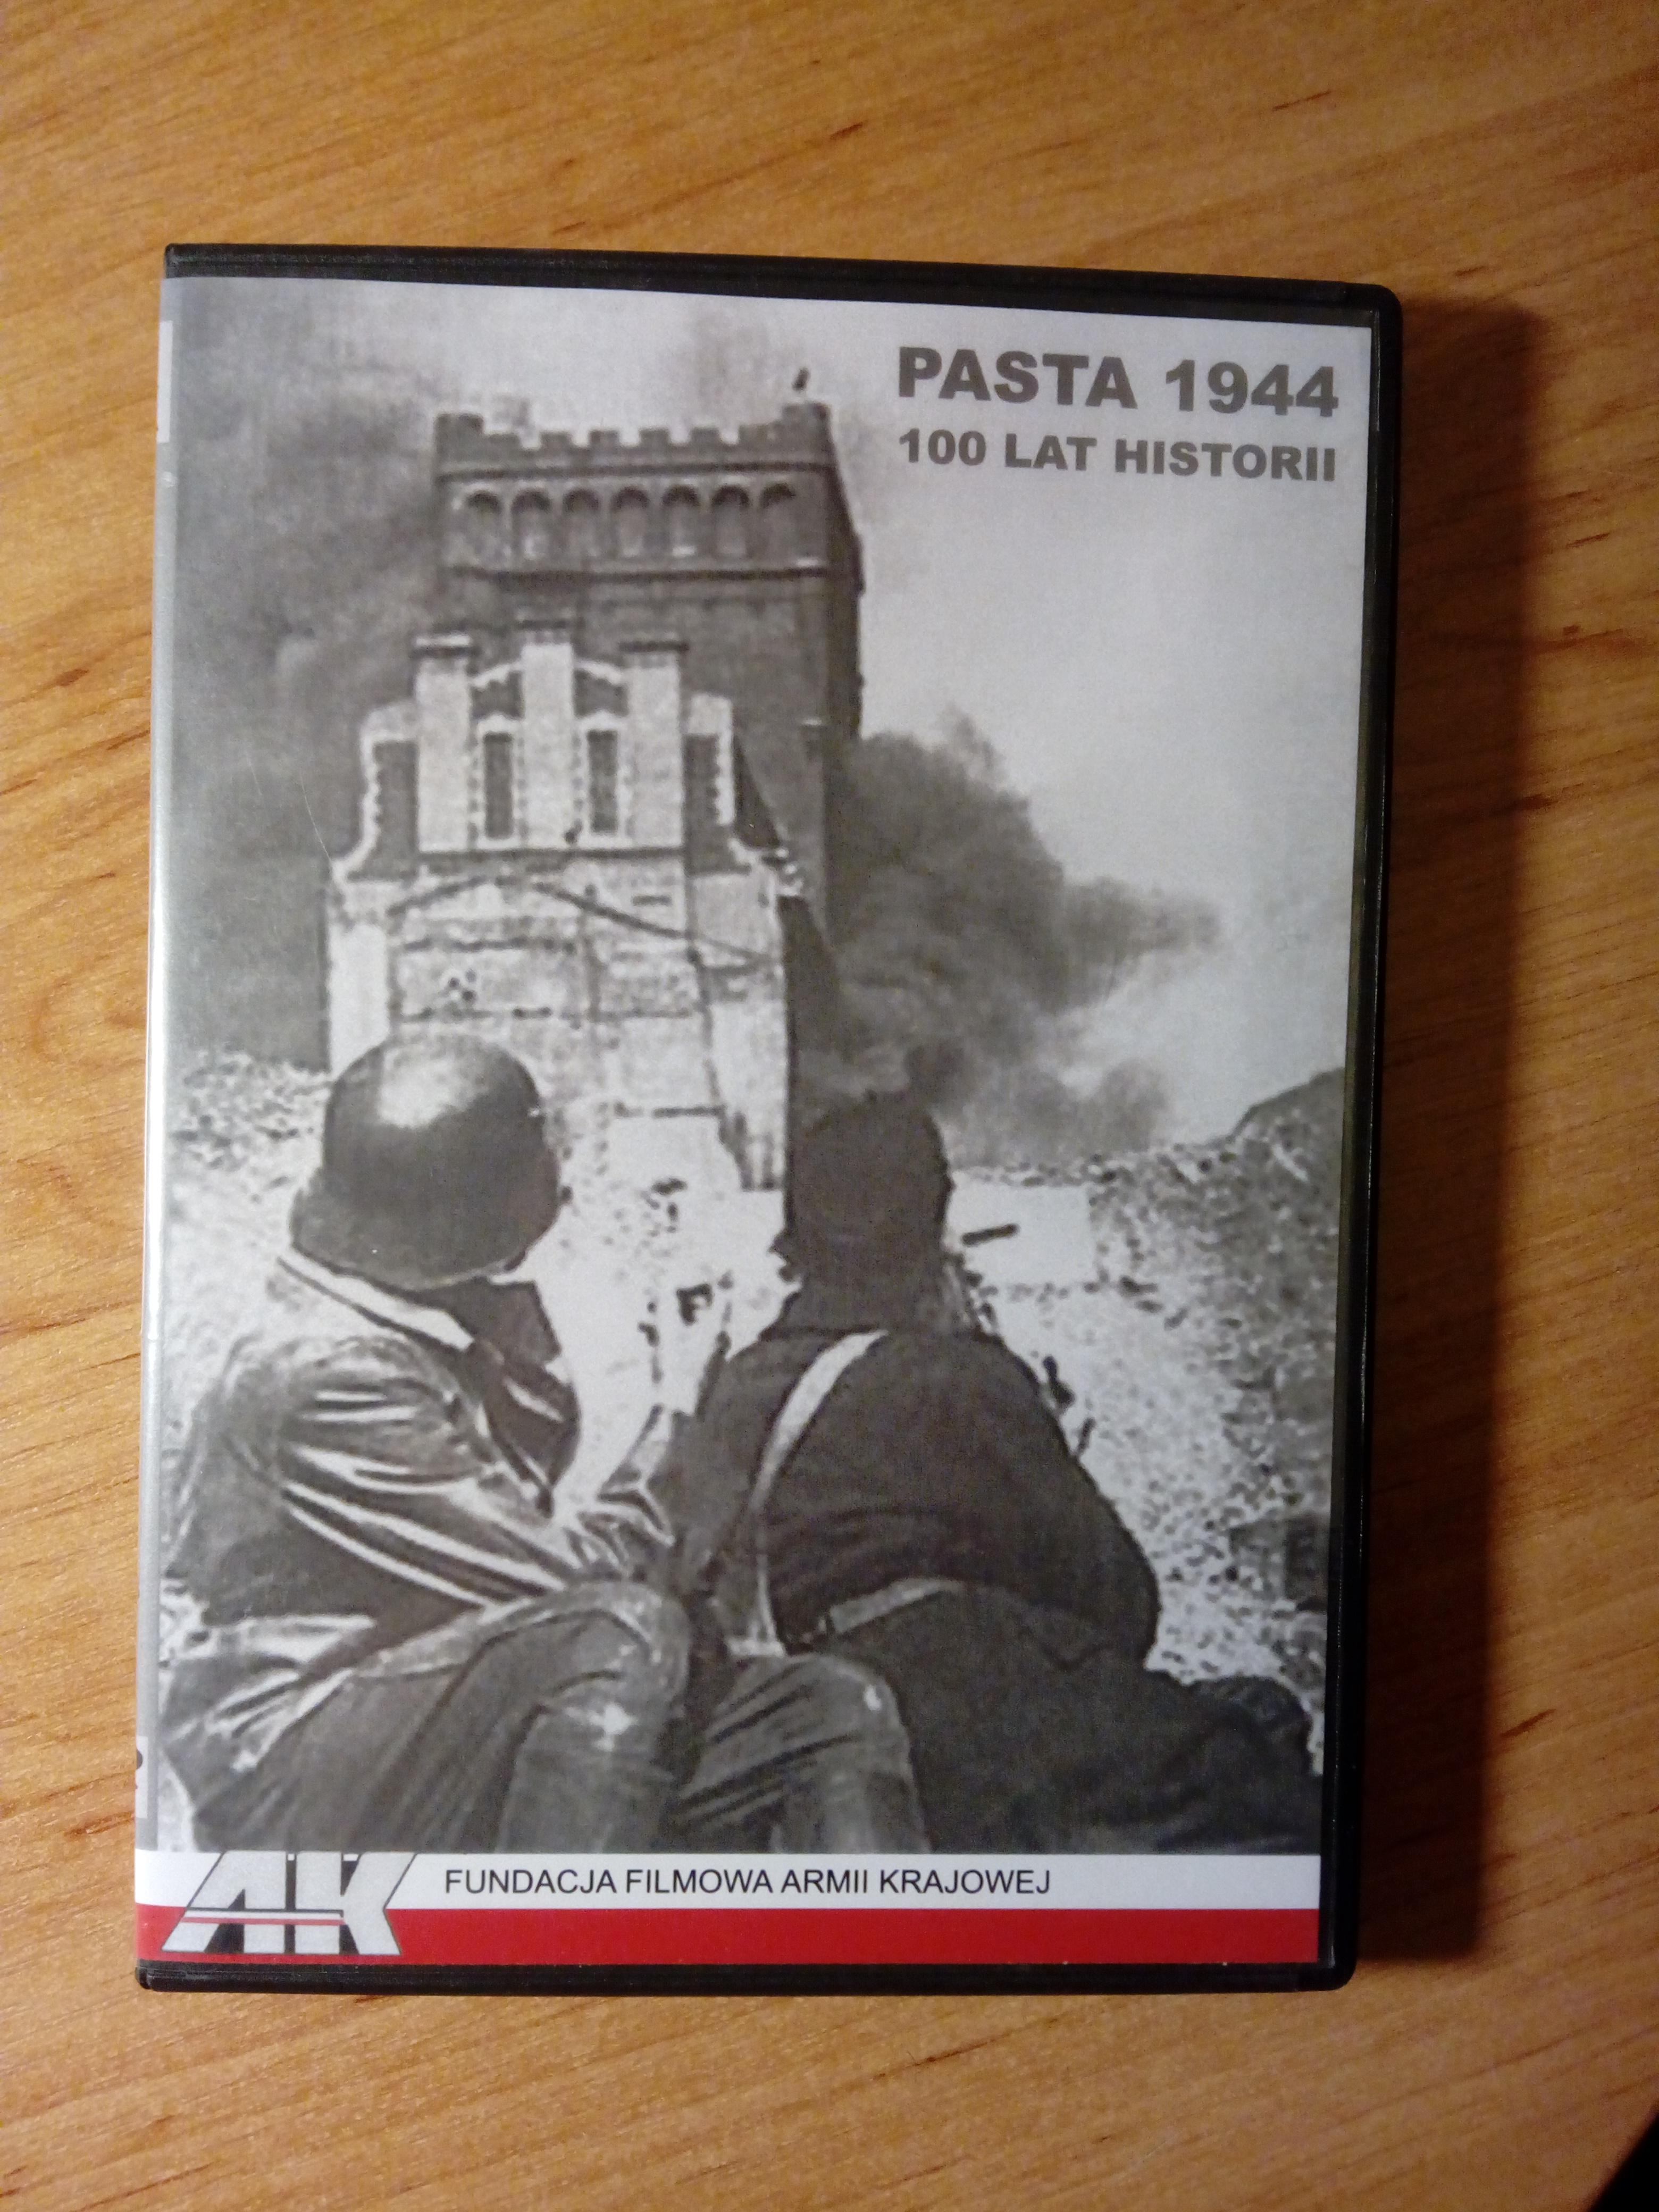 Pasta 1944 100 lat historii DVD (M.Widarski)